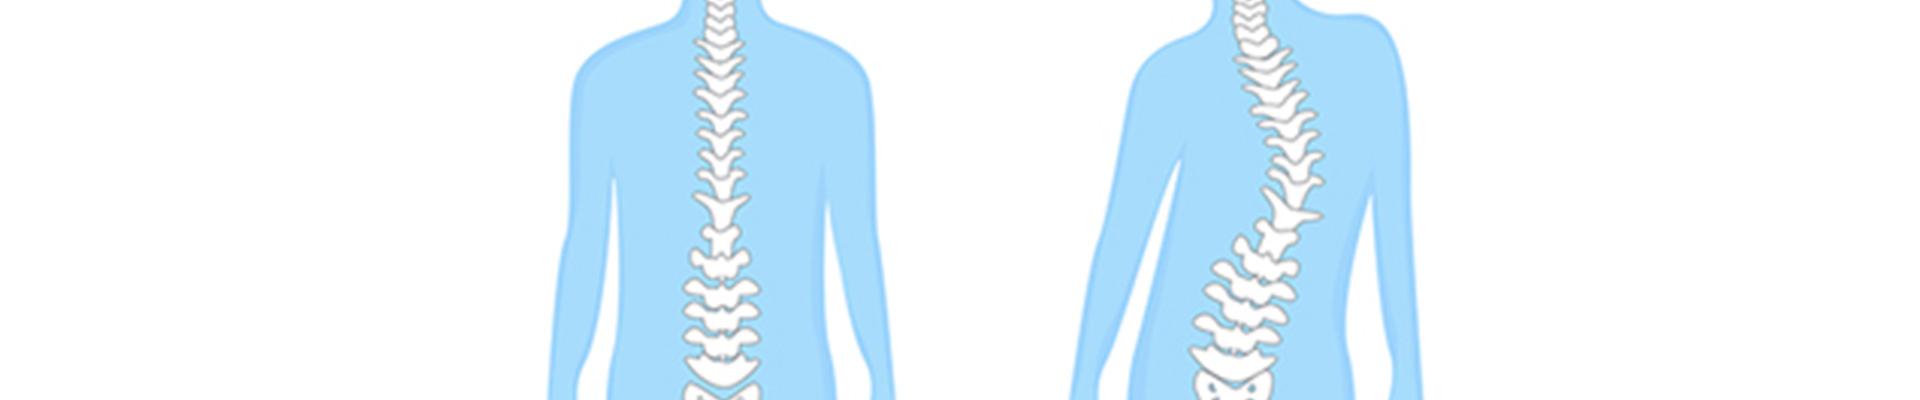 skoliosebehandlung-physio-pyrbaum-header